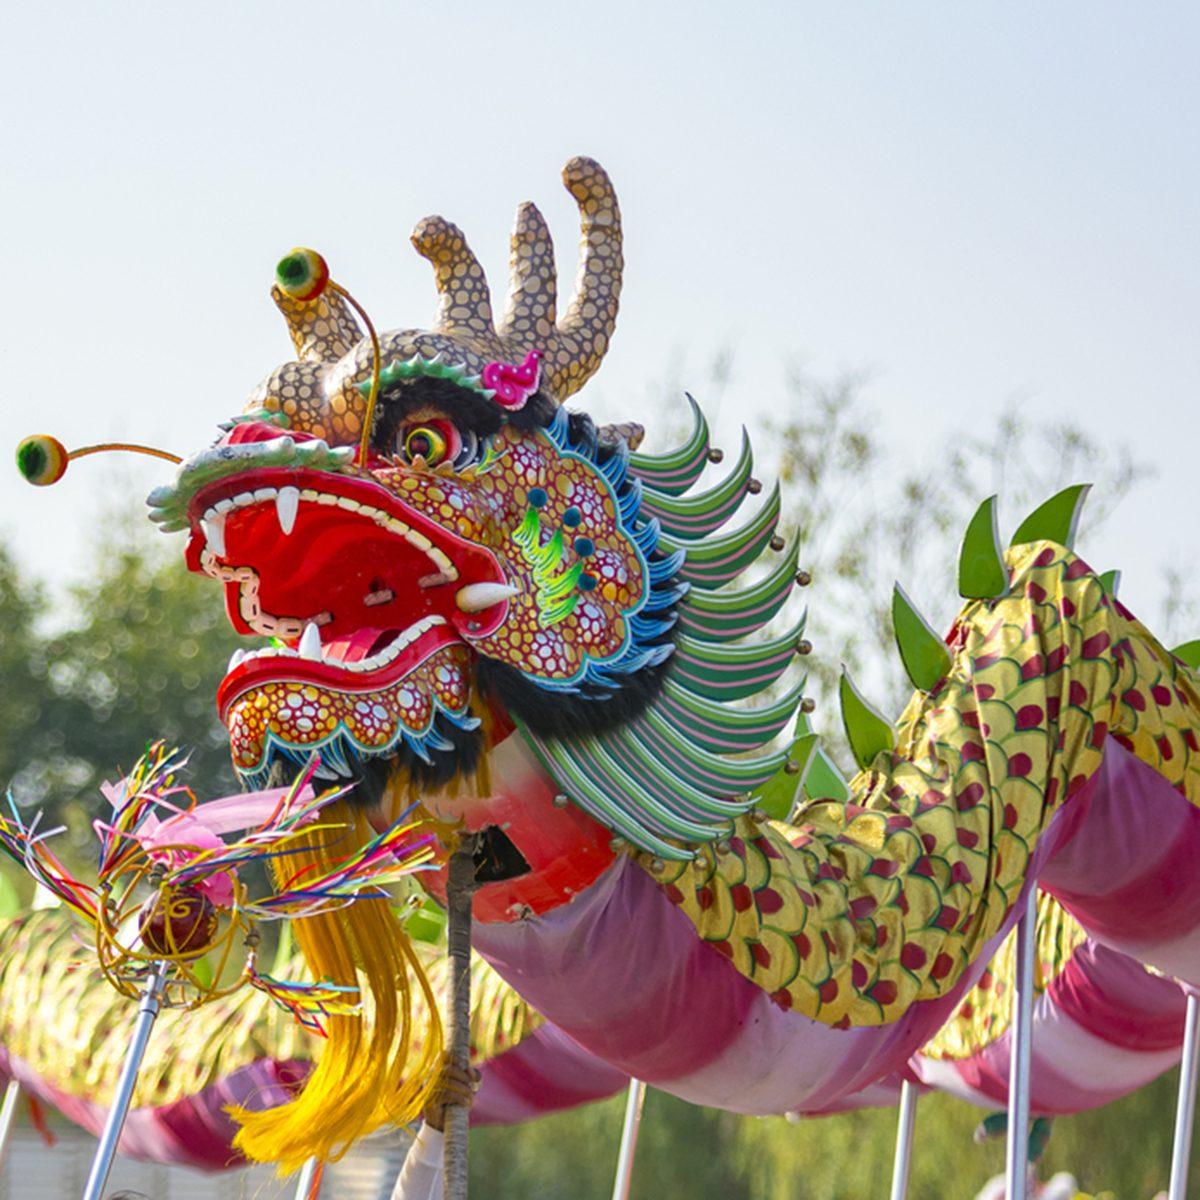 Dragon dance show in the festival procession Thailand.; Shutterstock ID 495213295